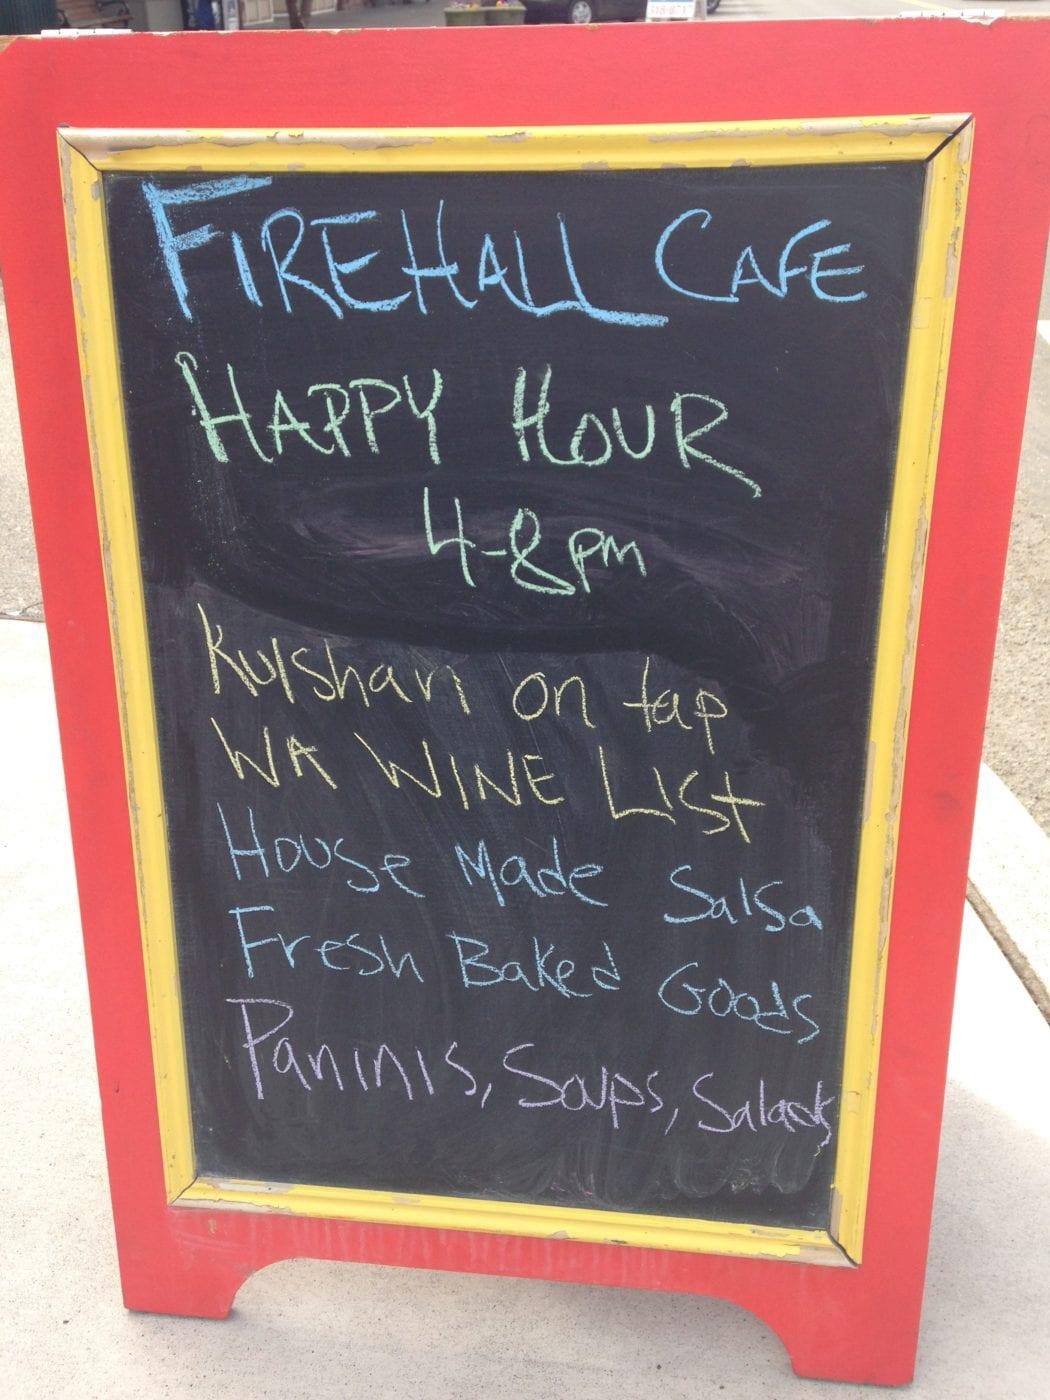 Firehall Cafe Happy Hour